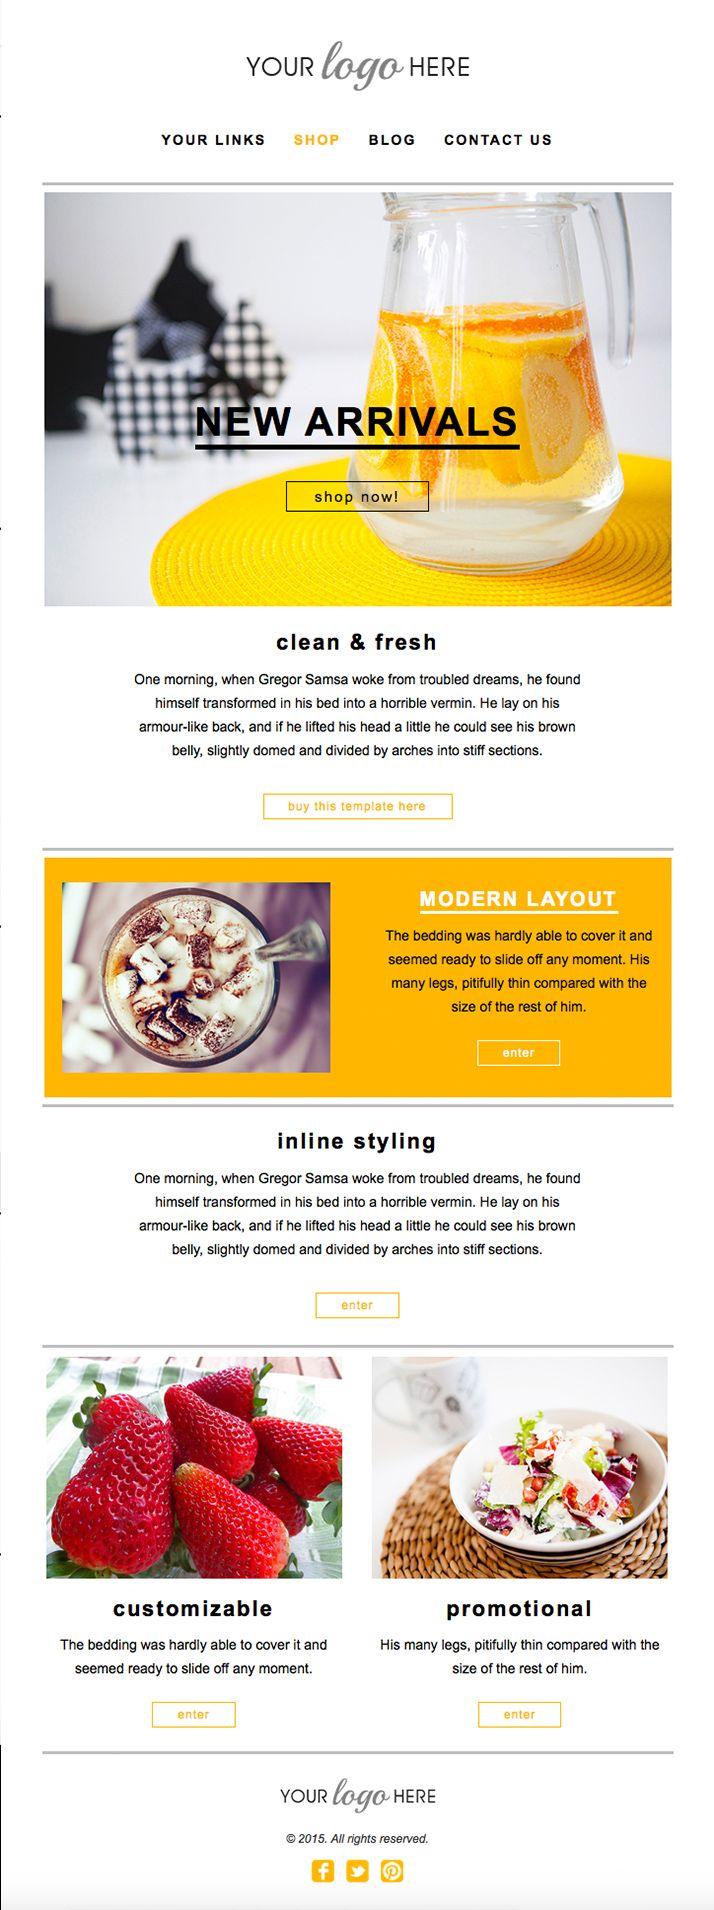 Fresh Modern design | E-Newsletter Template Design, handcoded, Mailchimp compatible, fully customizable.